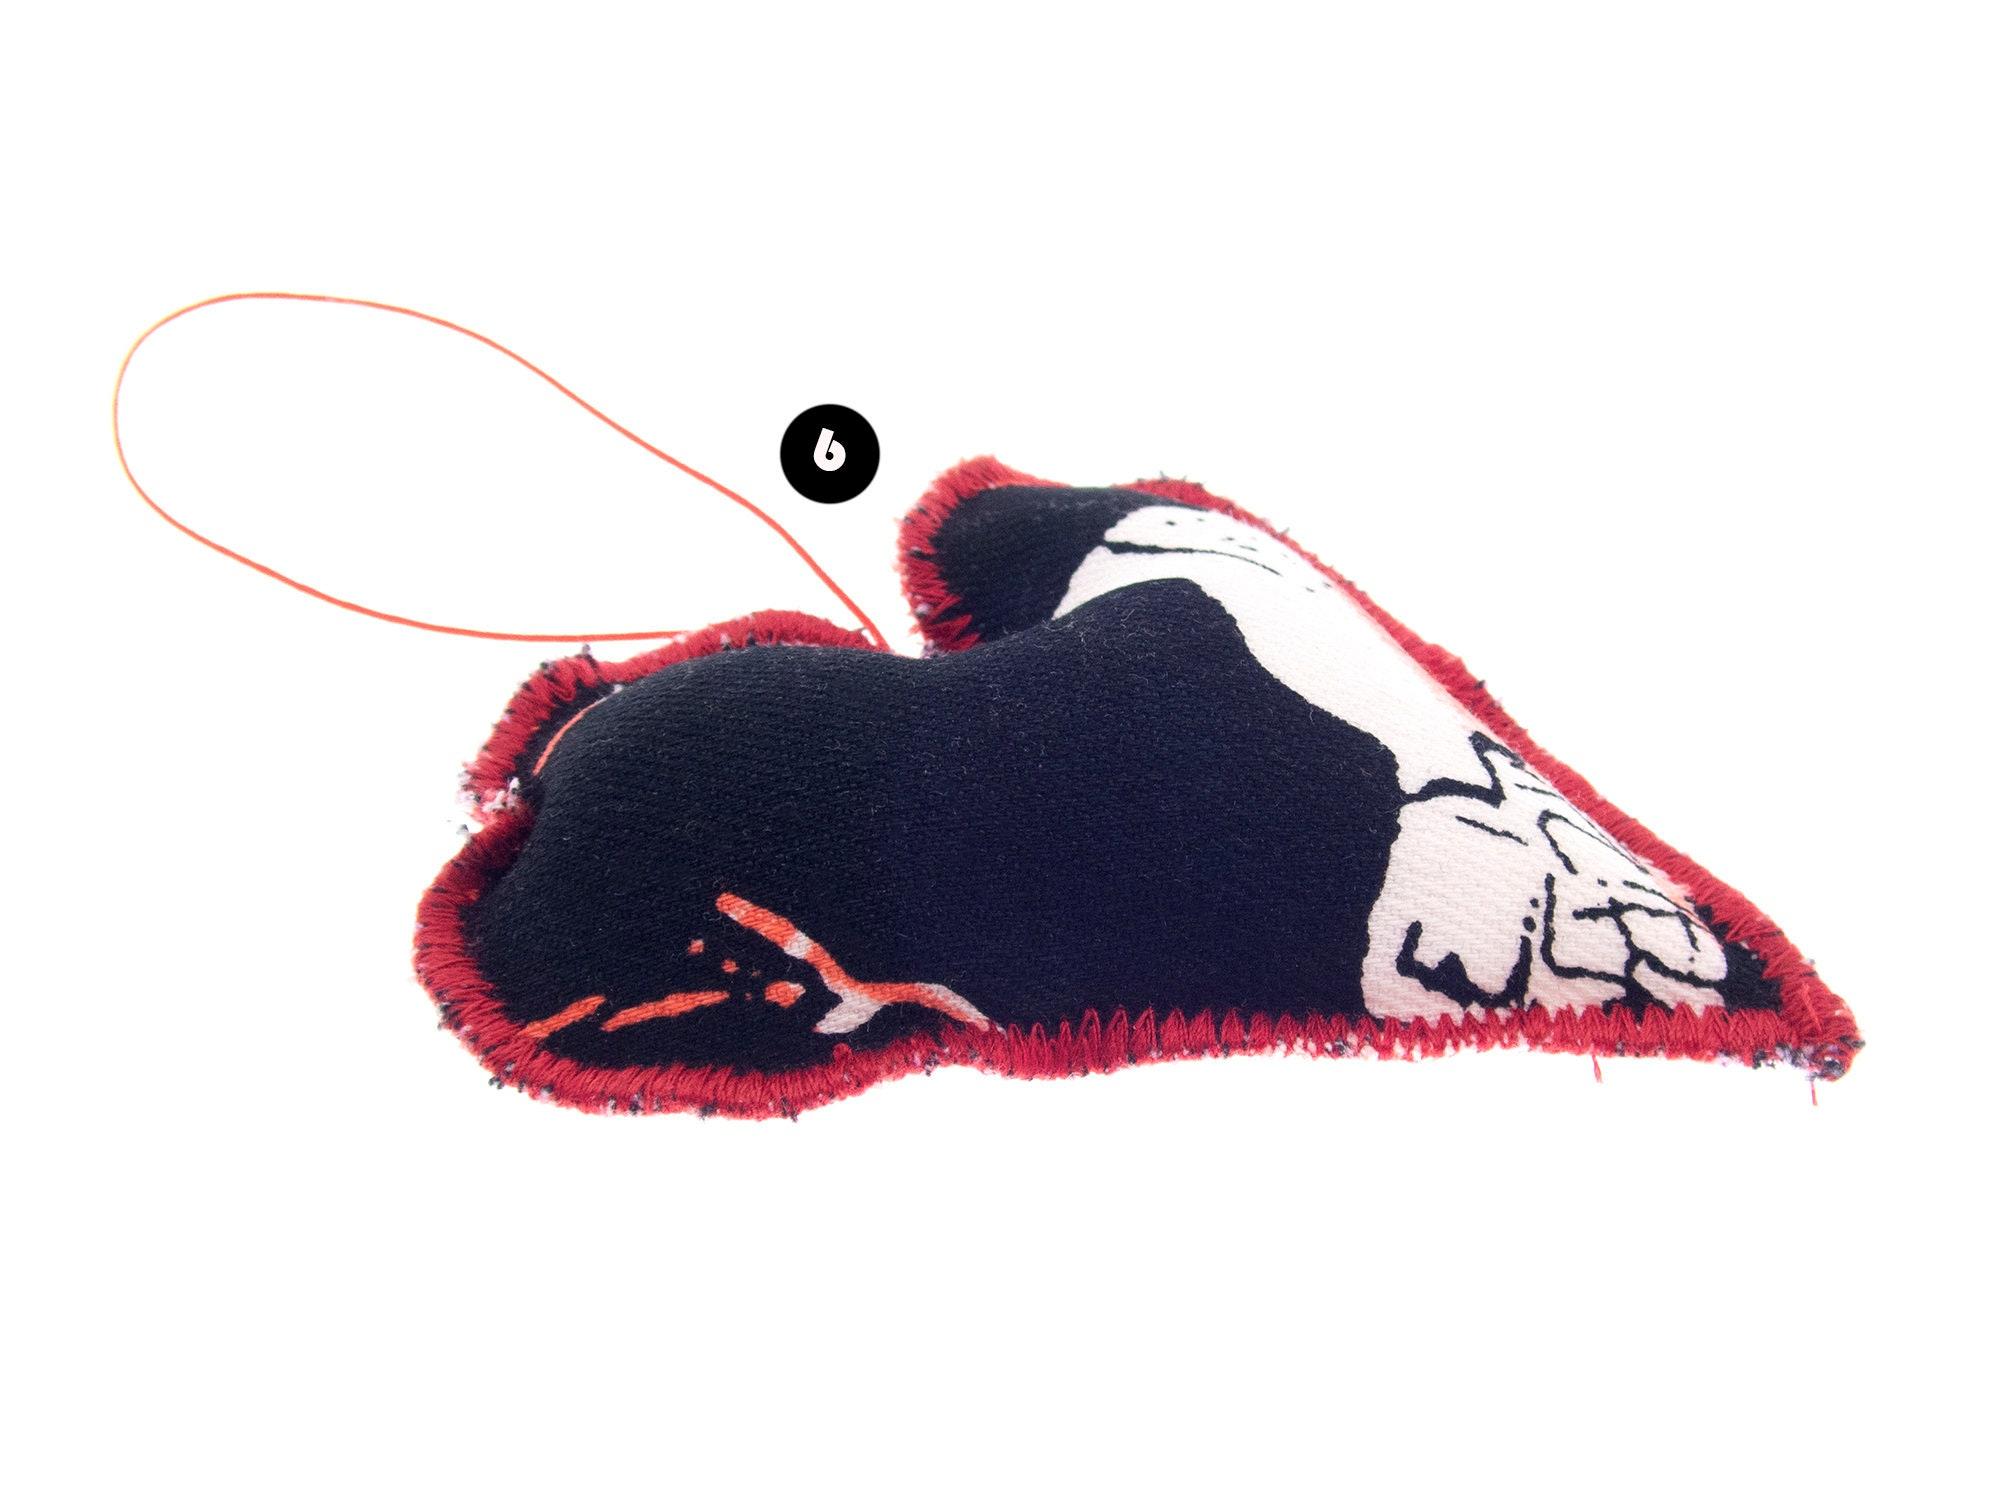 Cute Valentines Gift For Boyfriend Abroad Cute Gift For Boyfriend Valentines Day Black Red Stuffed Heart